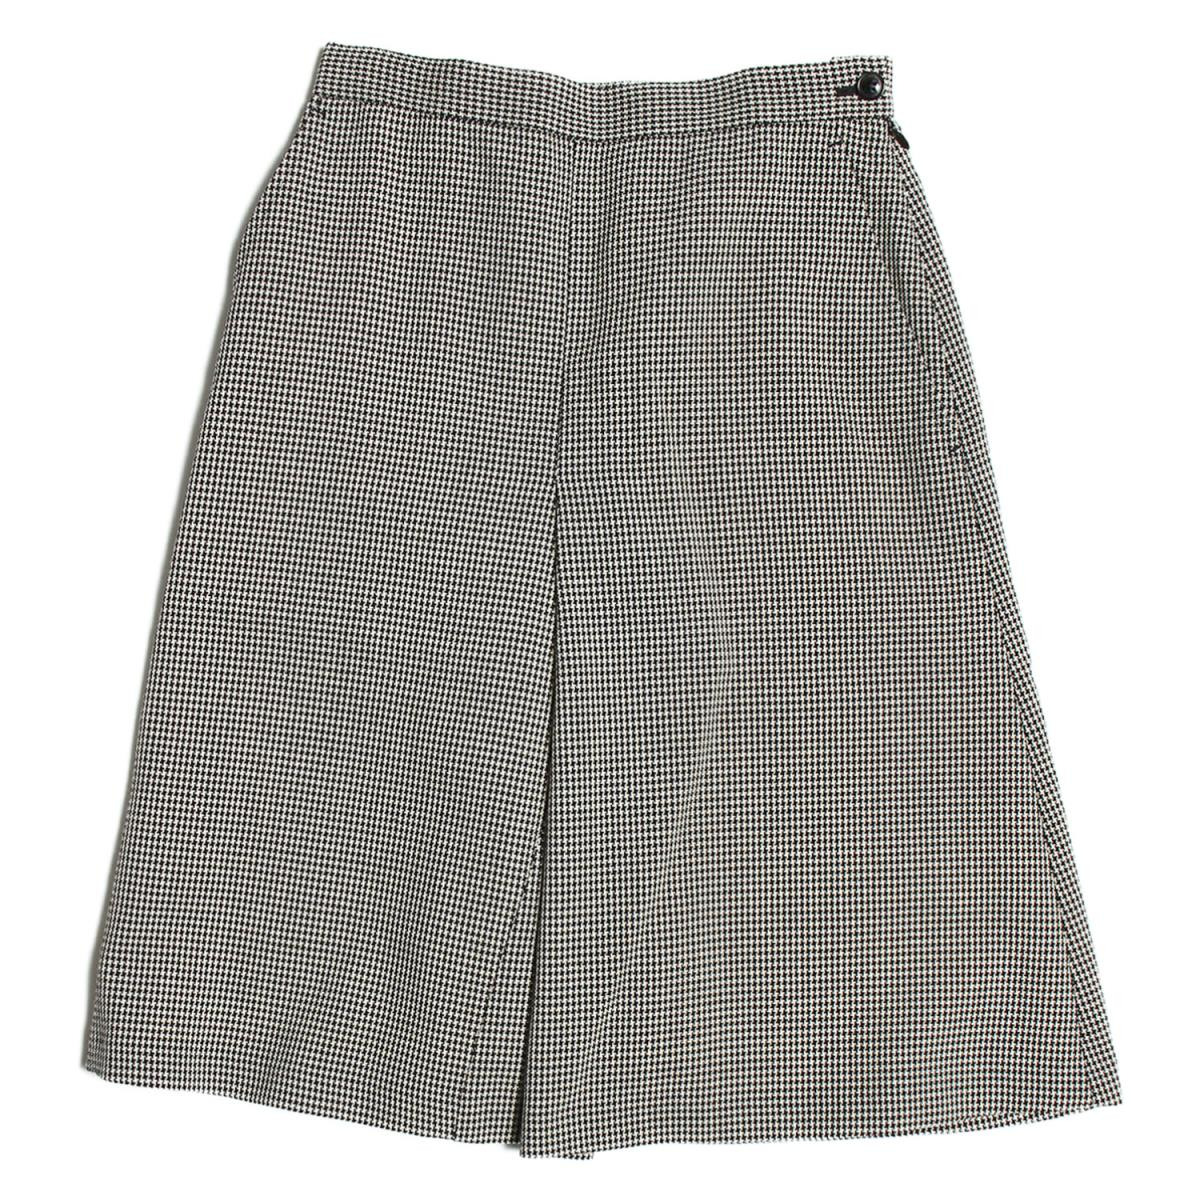 beautiful peple(ビューティフルピープル) w.hounds-tooth semi flare skirt セミ フレアスカート ブラック×ホワイト 34(XS) 【レディース】【中古】【美品】【K2379】